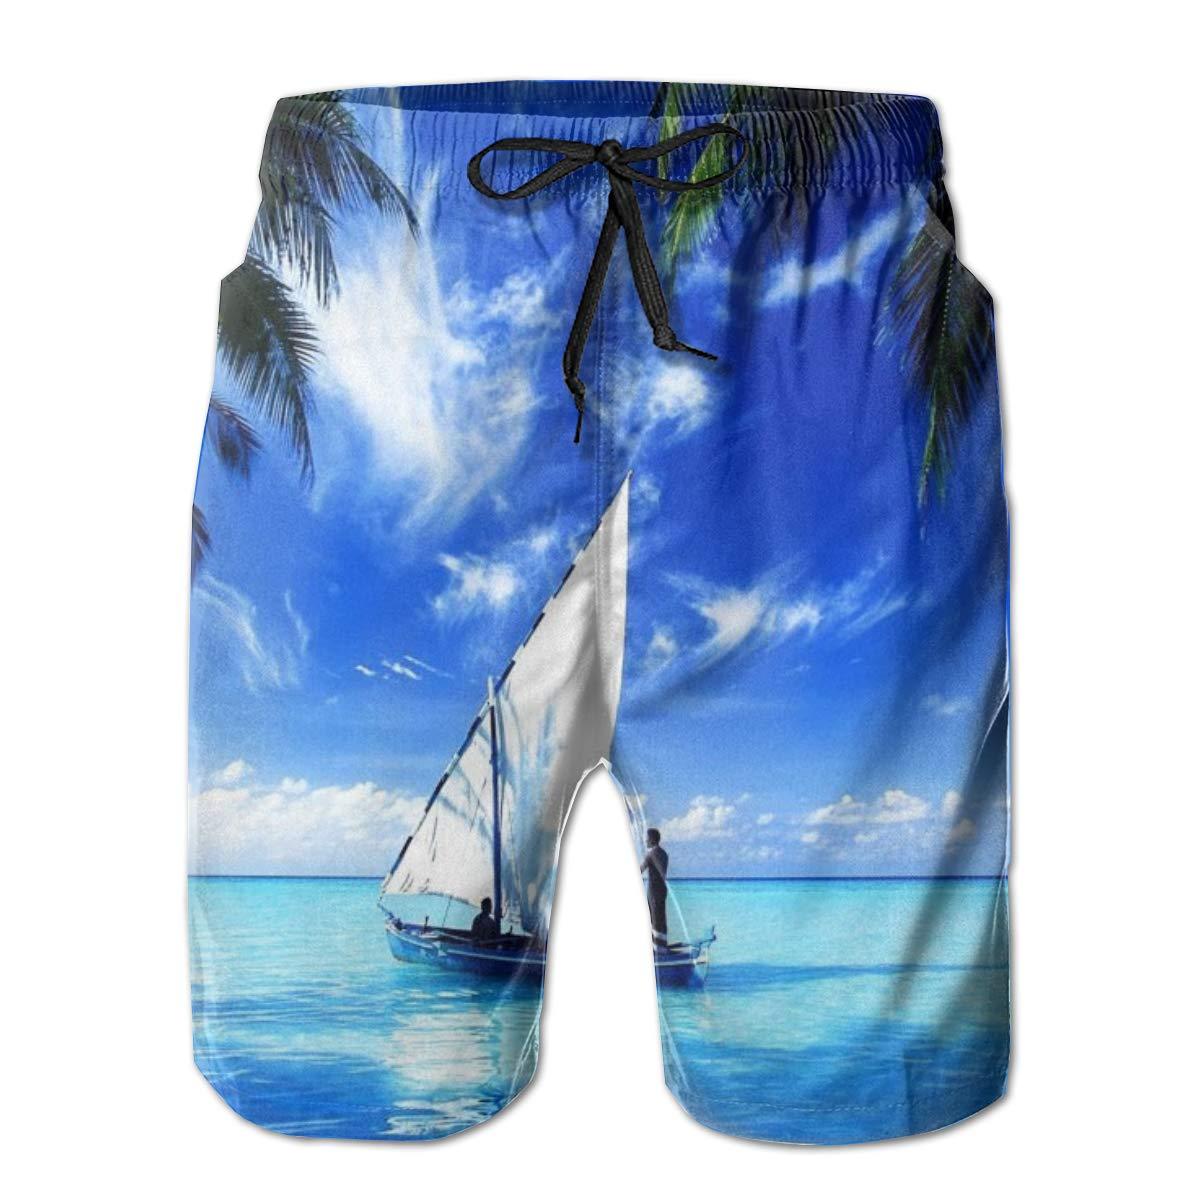 WMDJEG The Open Skyline of The Island Mens Summer Beachwear Sports Running Swim Board Shorts Mesh Lining